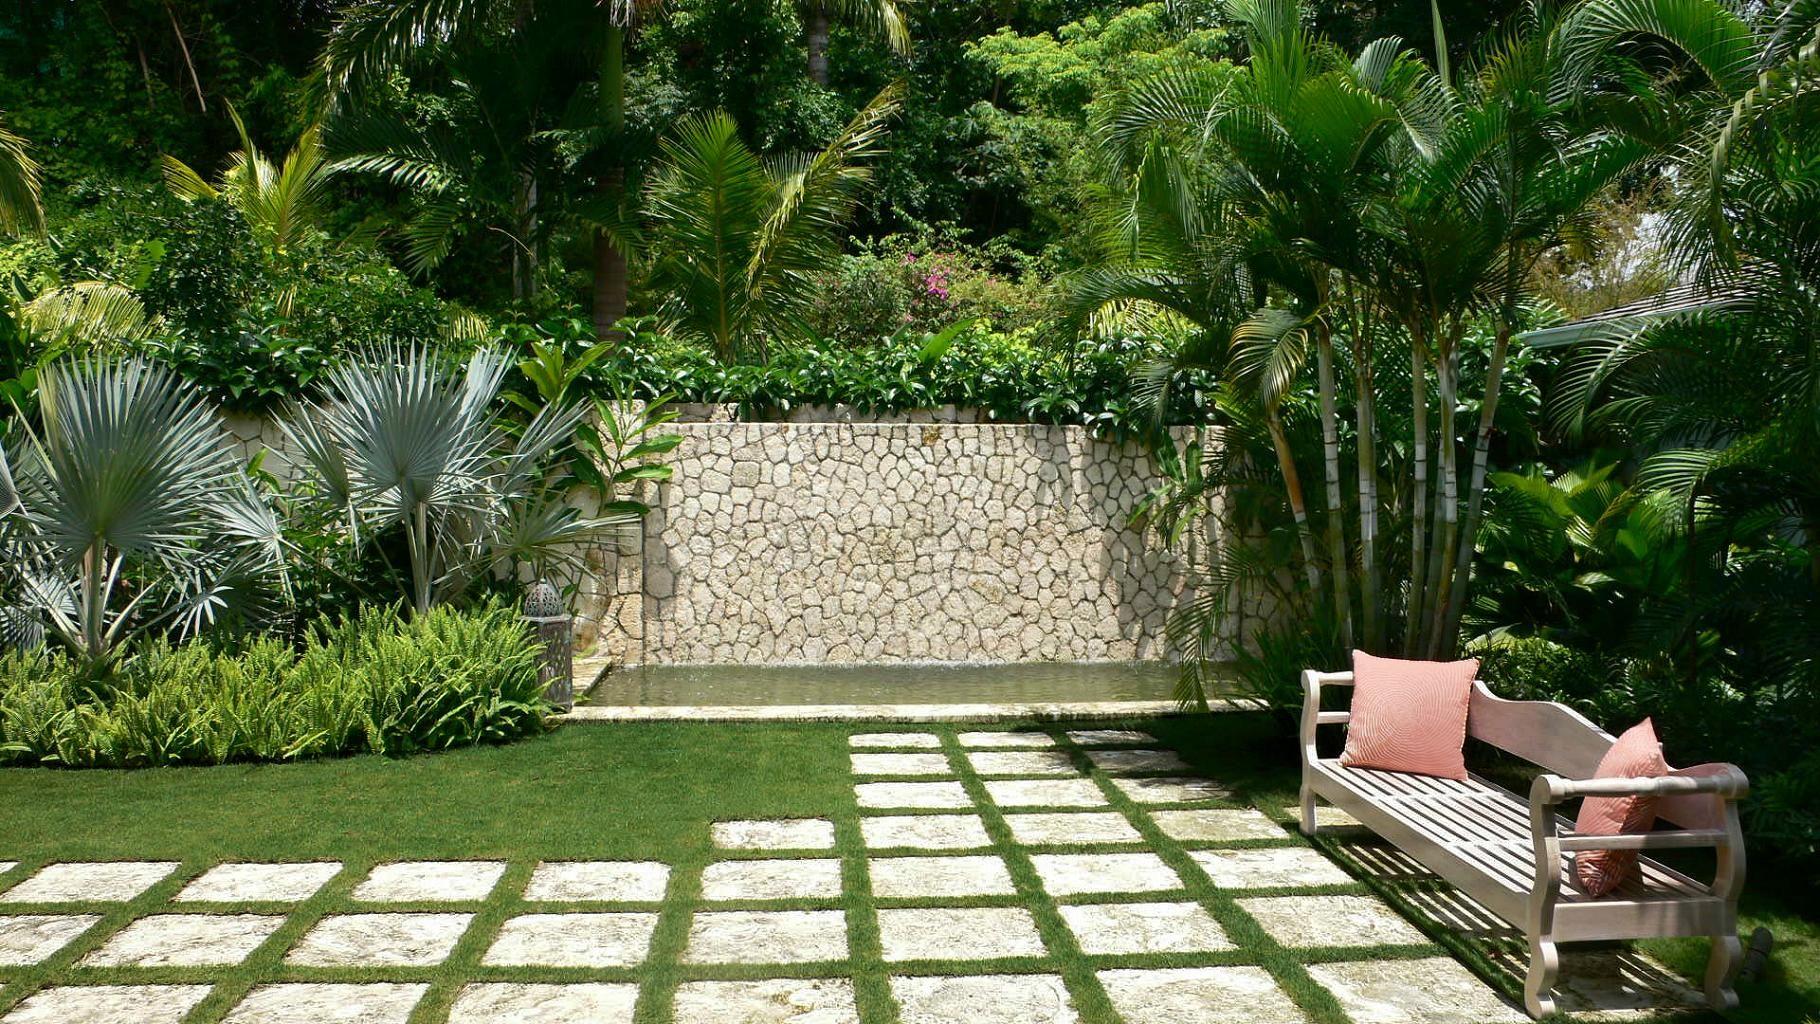 Balinese Courtyard Compound Paving Bali Style Minimalist Garden Backyard Garden Tropical Garden Design